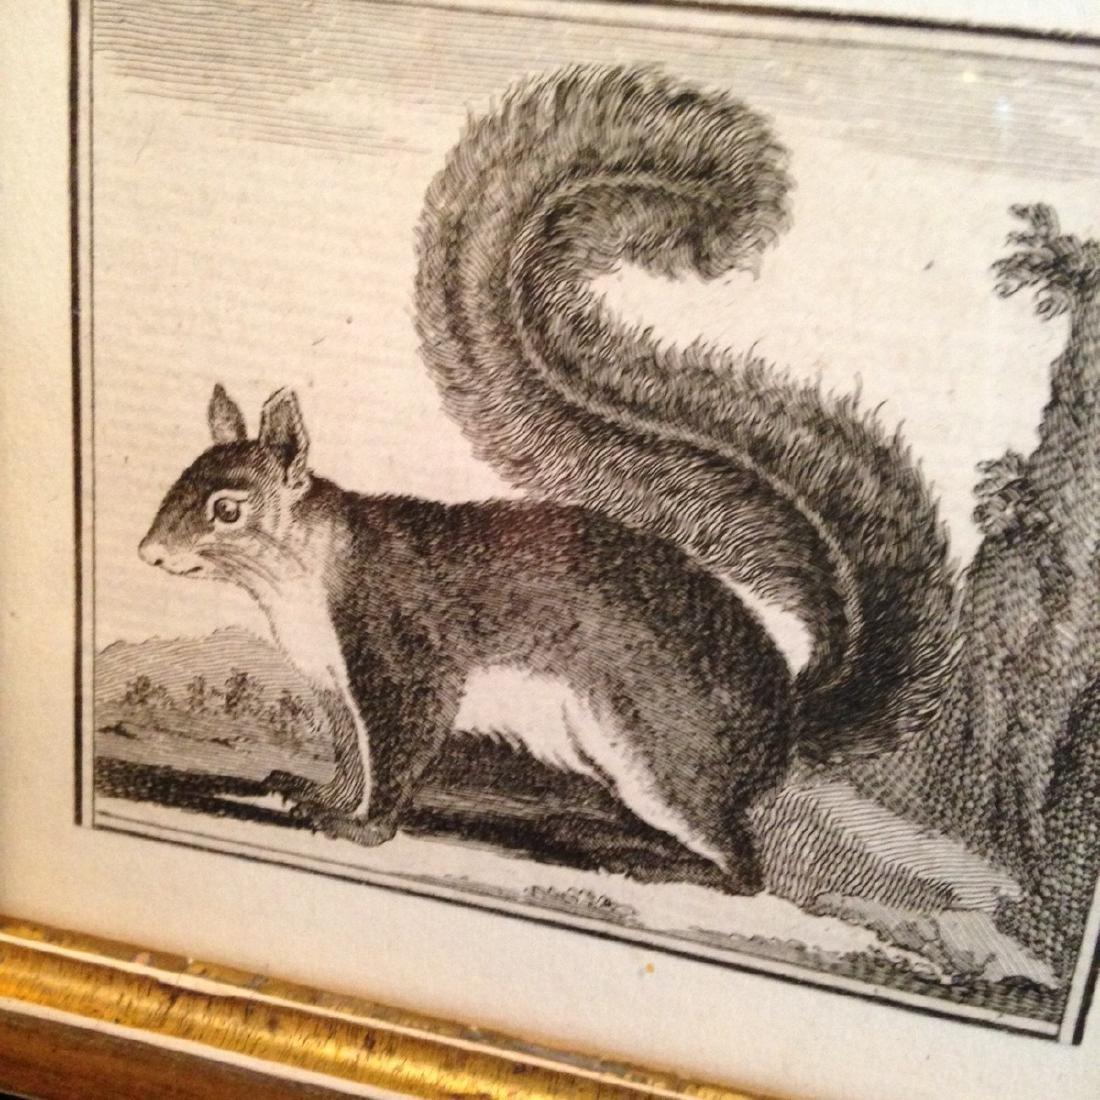 C1800 Squirrel Engraving - 2